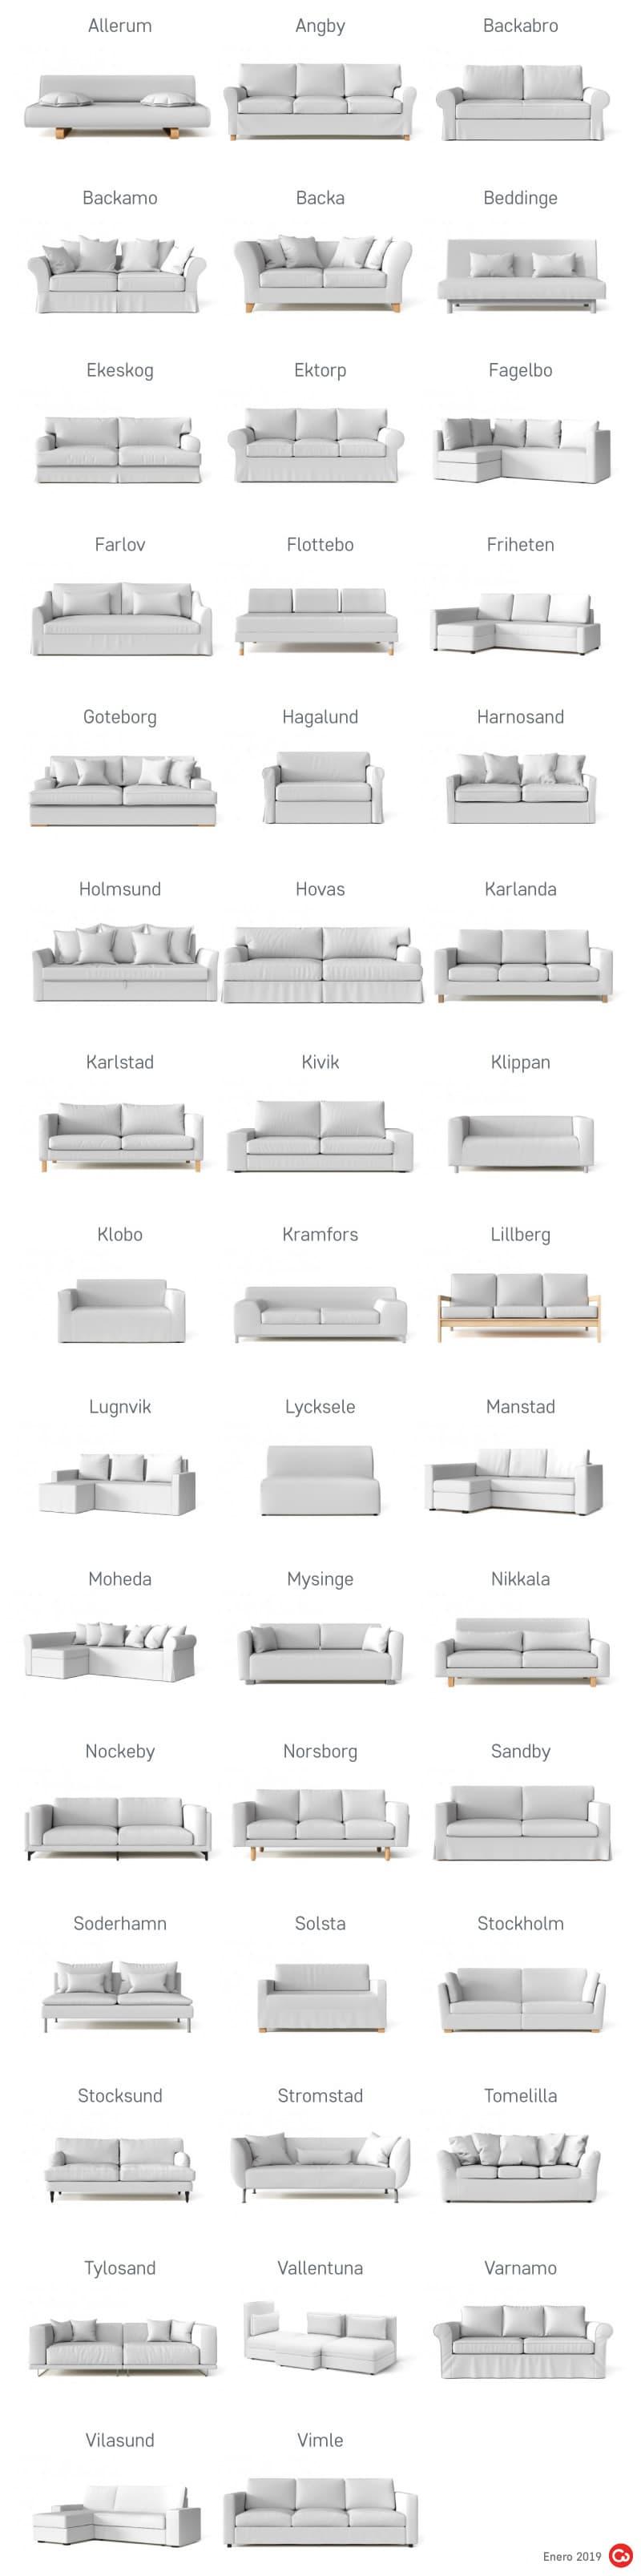 Sofás Descatalogados de IKEA